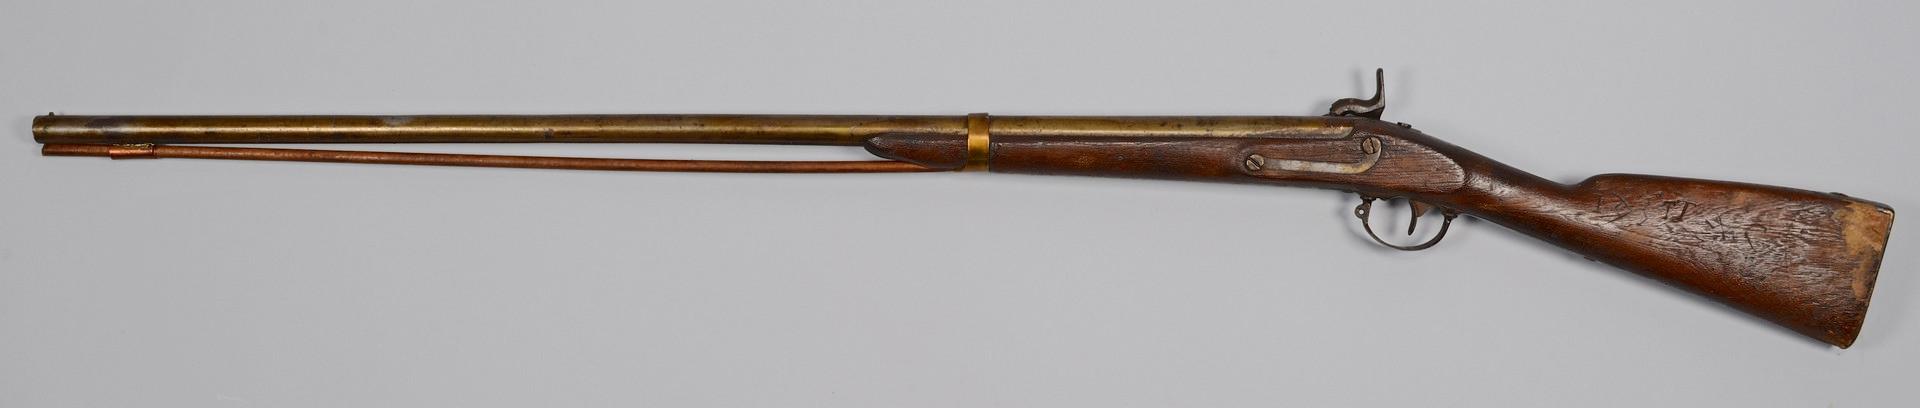 Lot 395: 1842 Model Palmetto Armory Musket, Modified